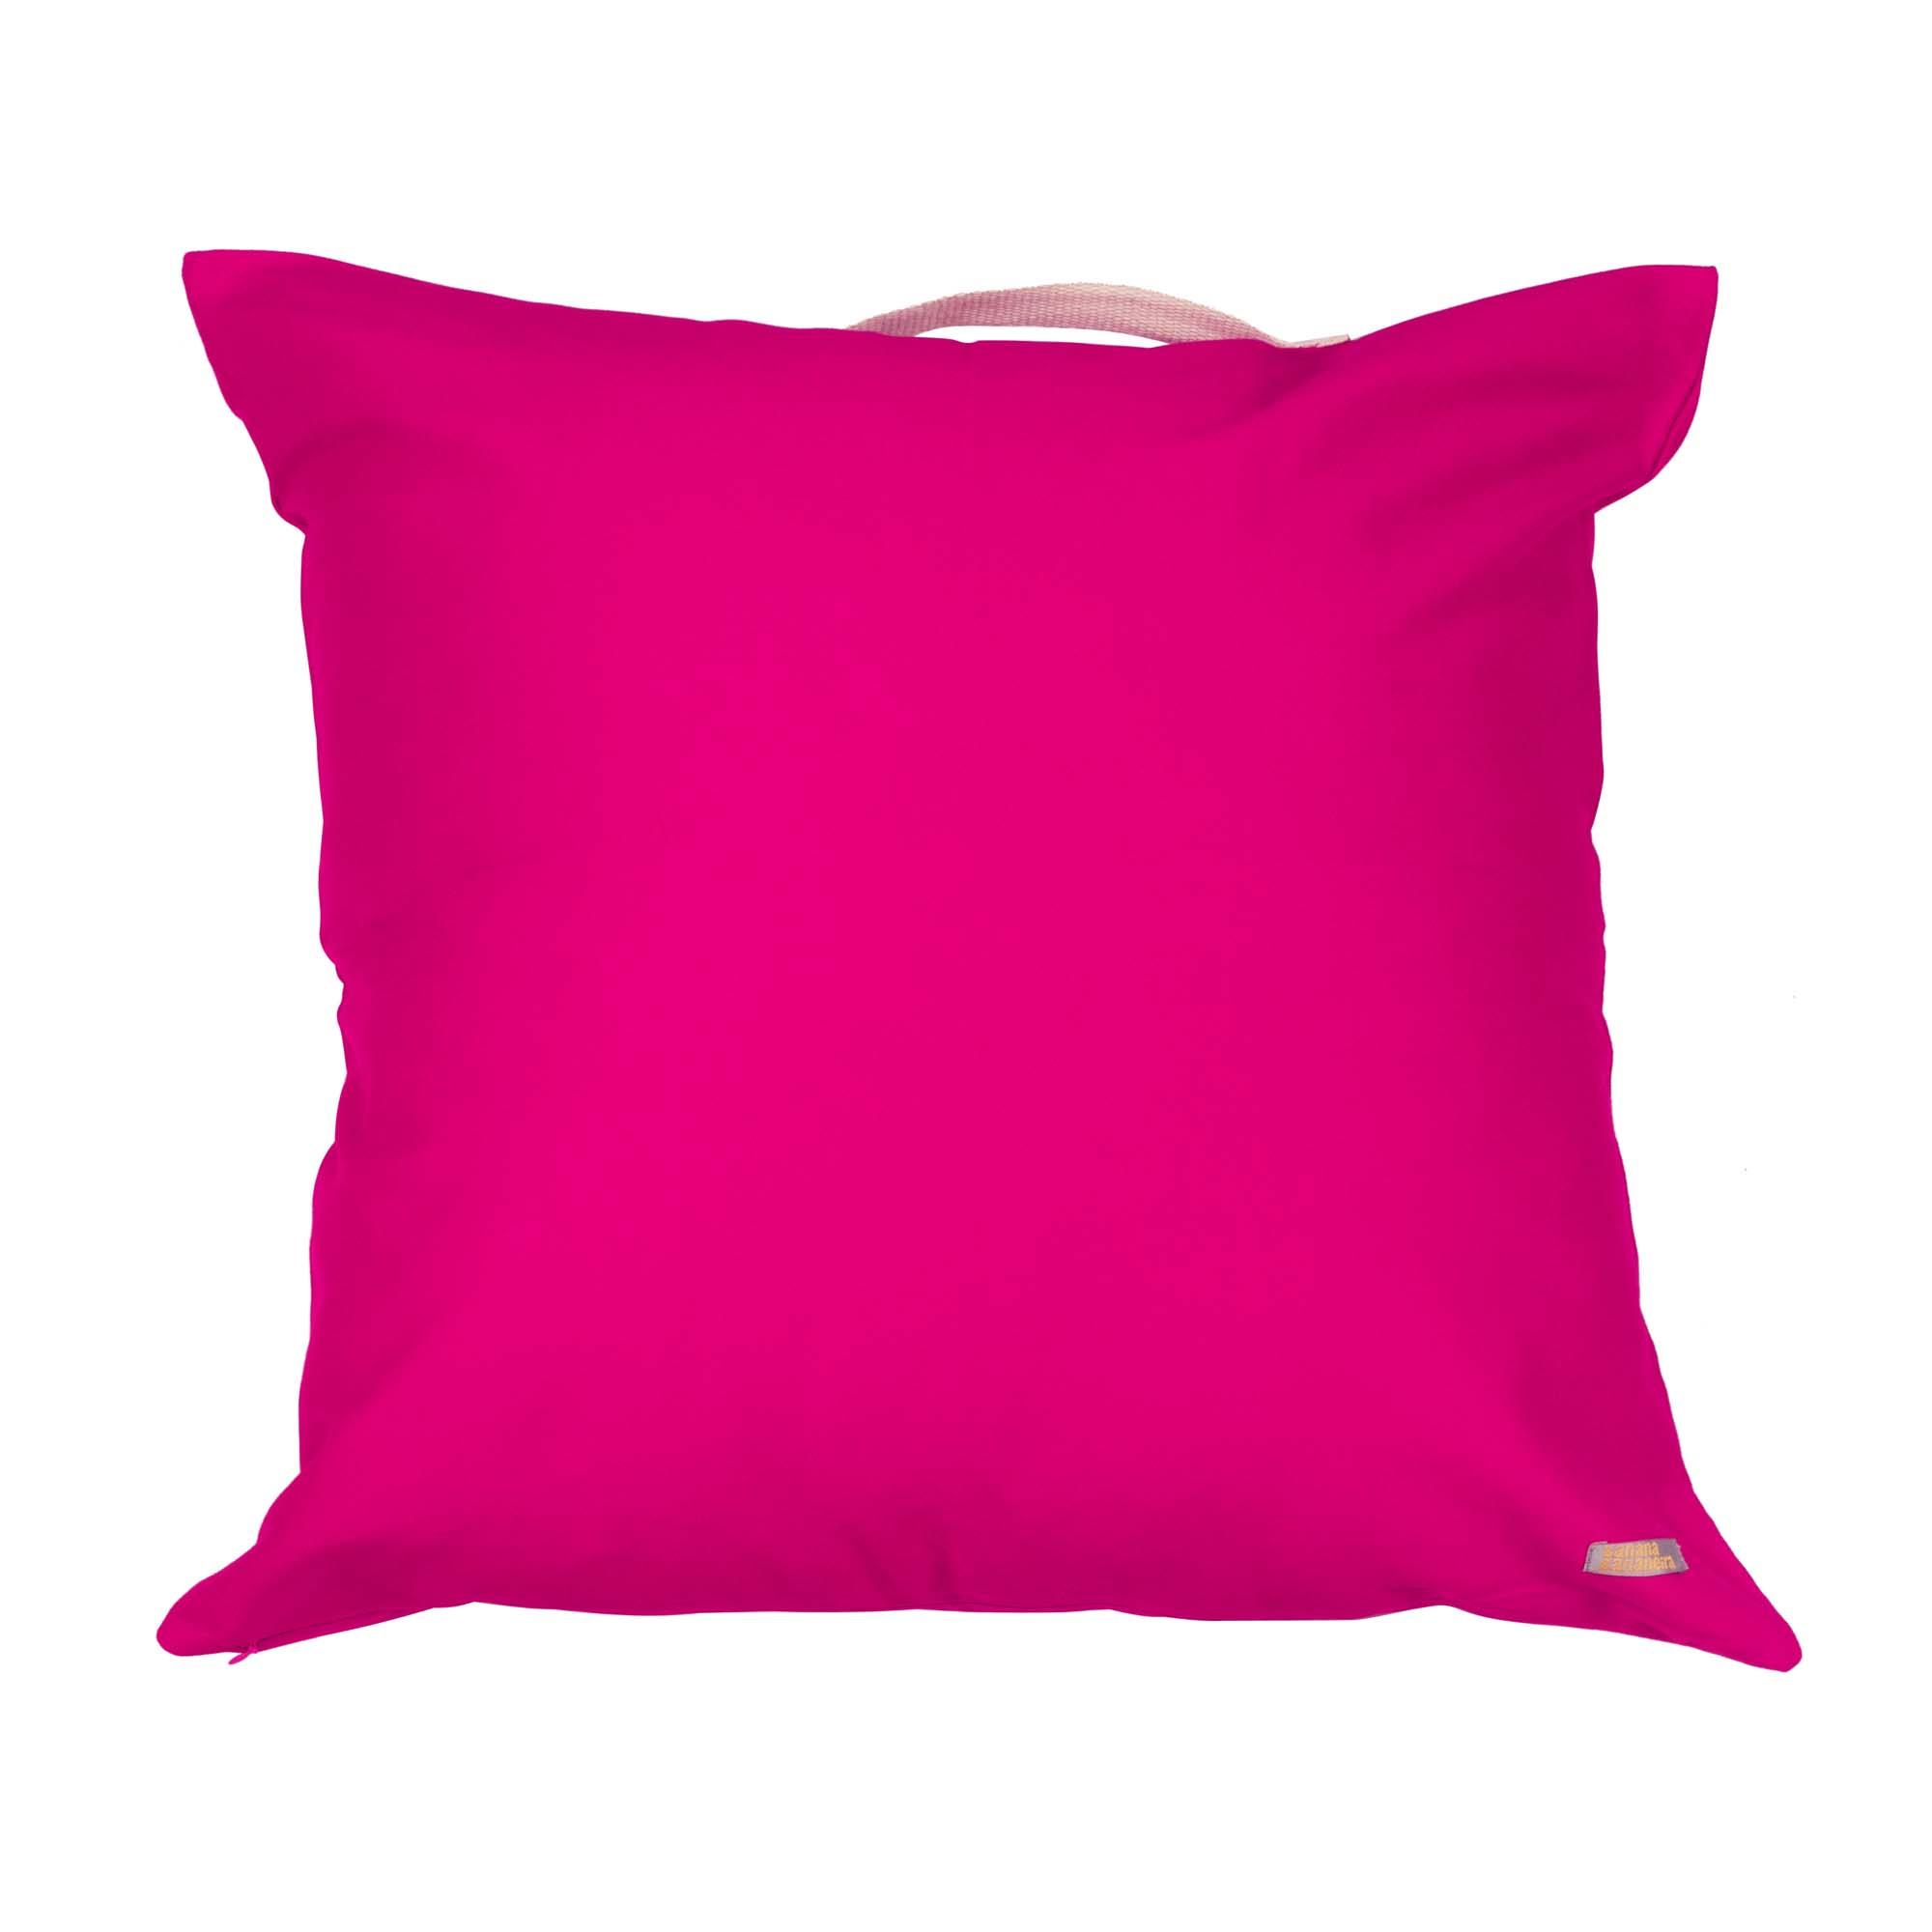 Almofadão pufe pink